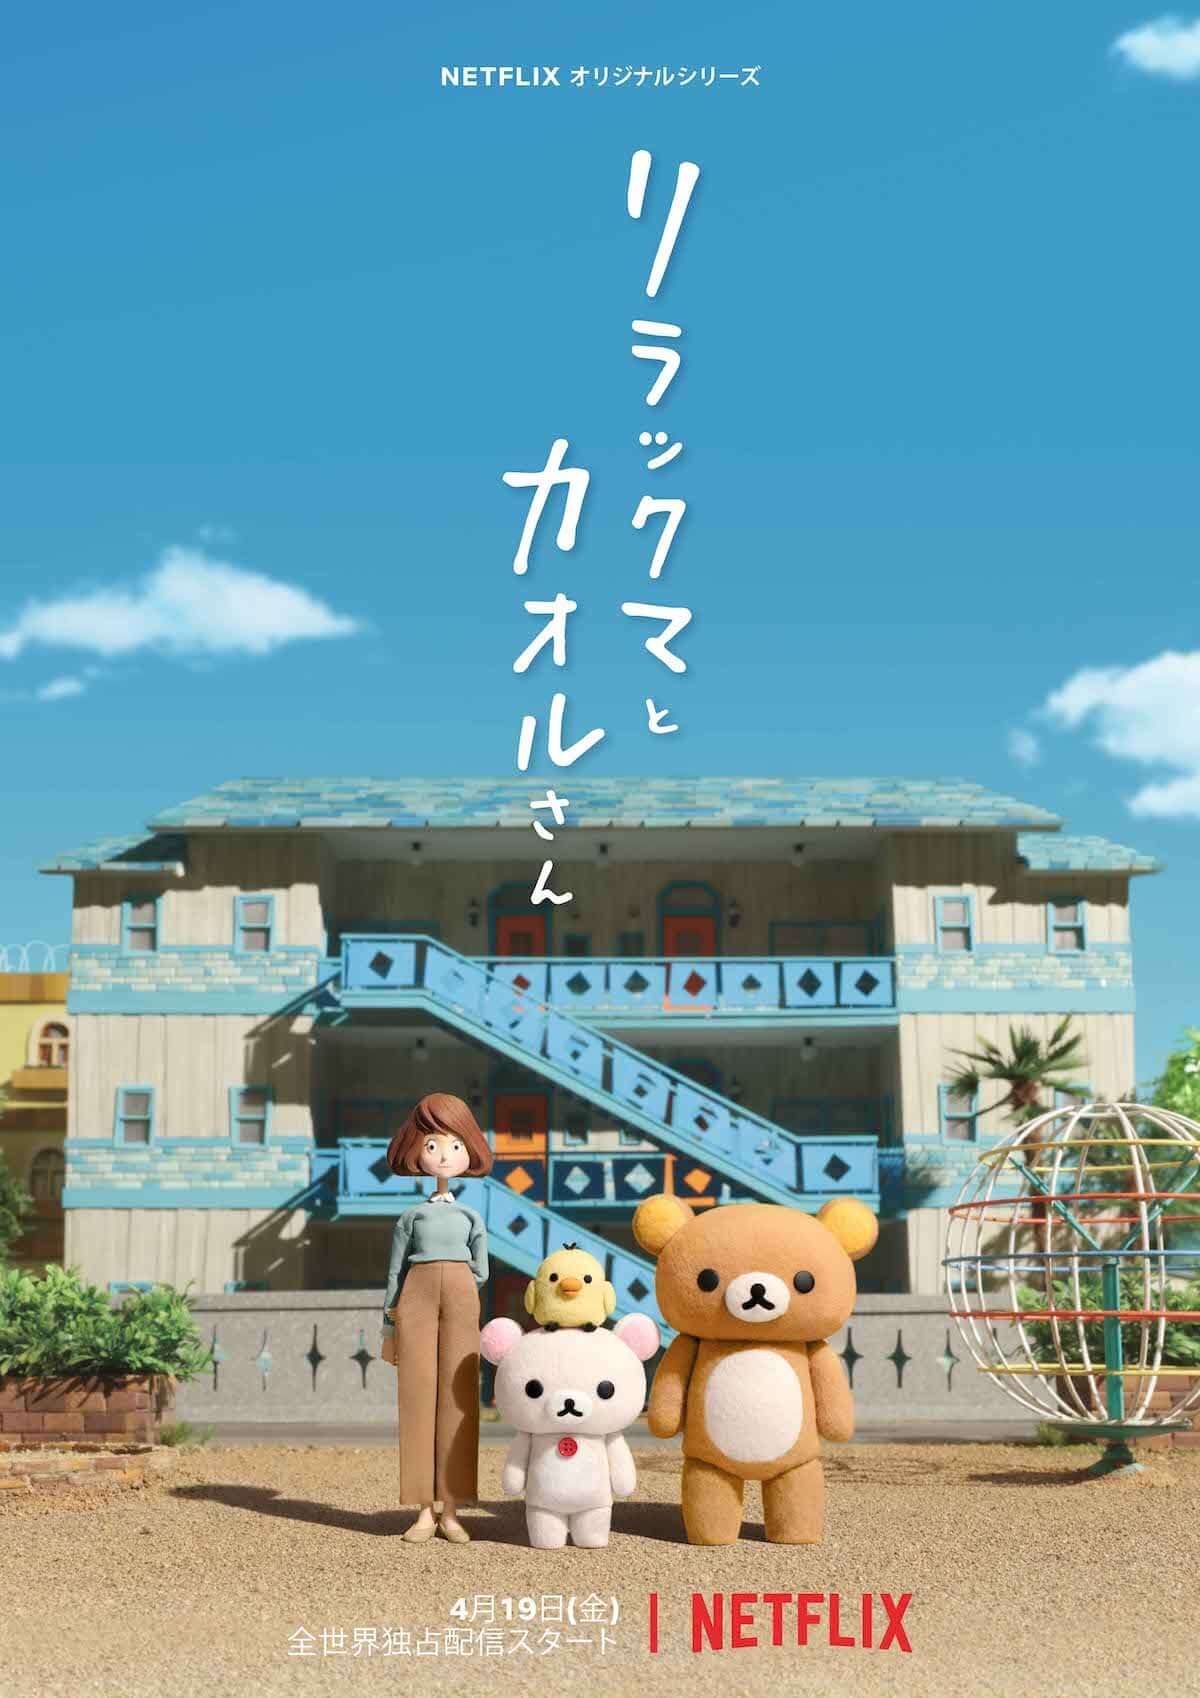 Netflixで新世紀エヴァンゲリオンが2019年春から全世界独占配信! film181127_netflix-anime_5-1200x1698